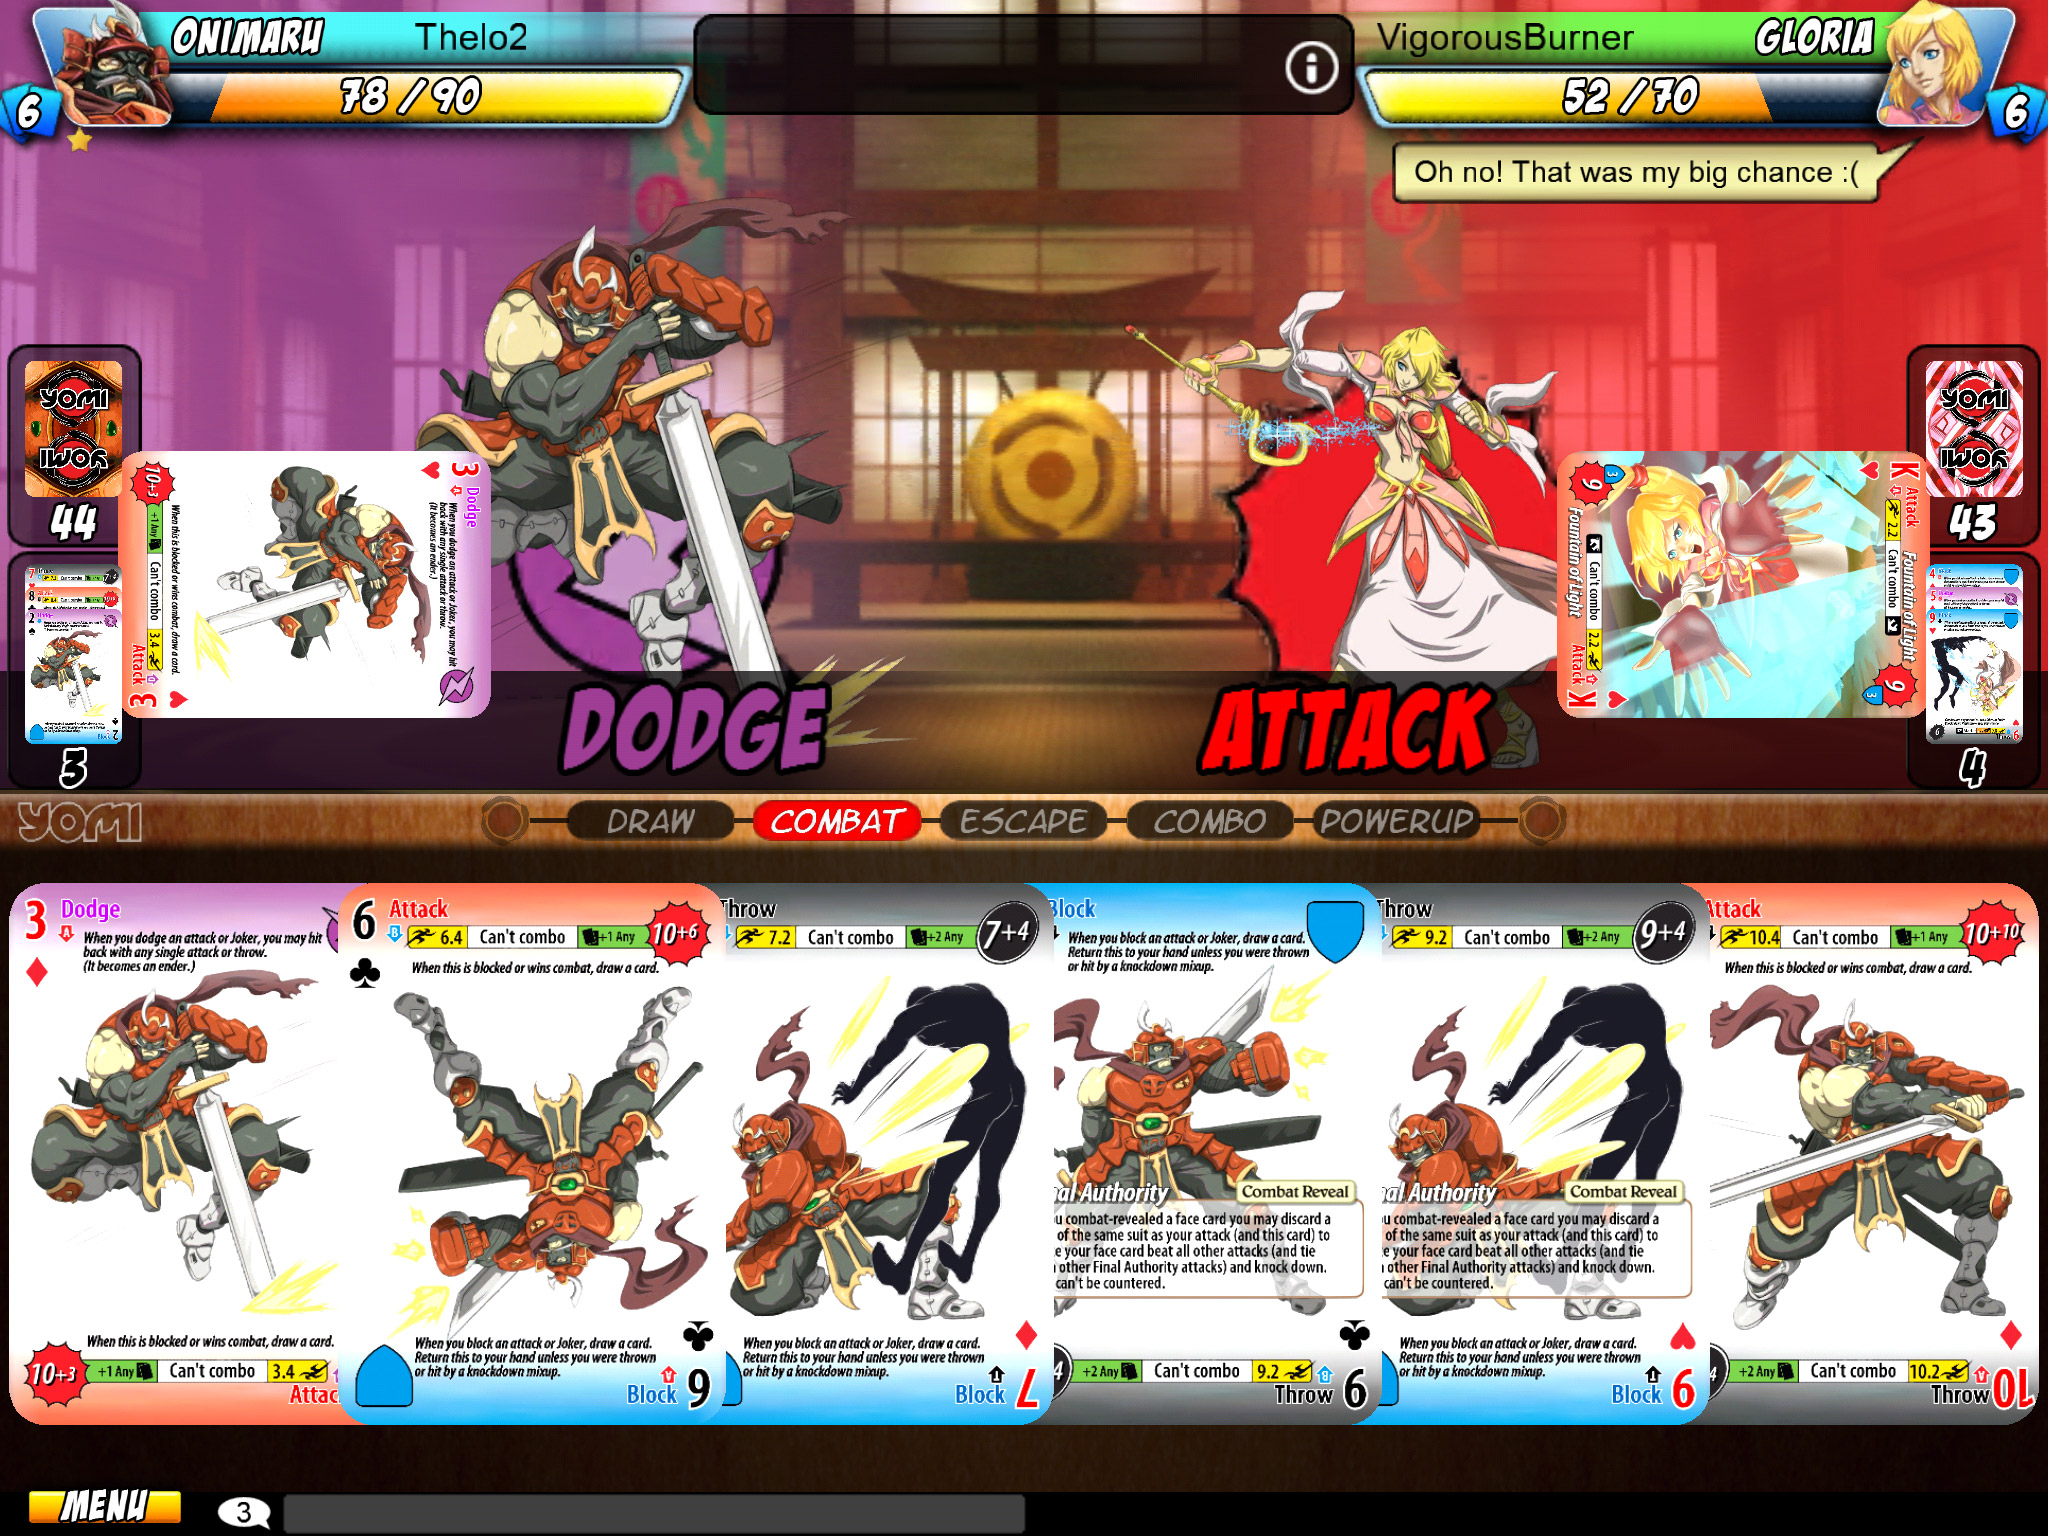 'Street Fighter' Dev Releasing Card-Battler 'Yomi' on iPad Next Week